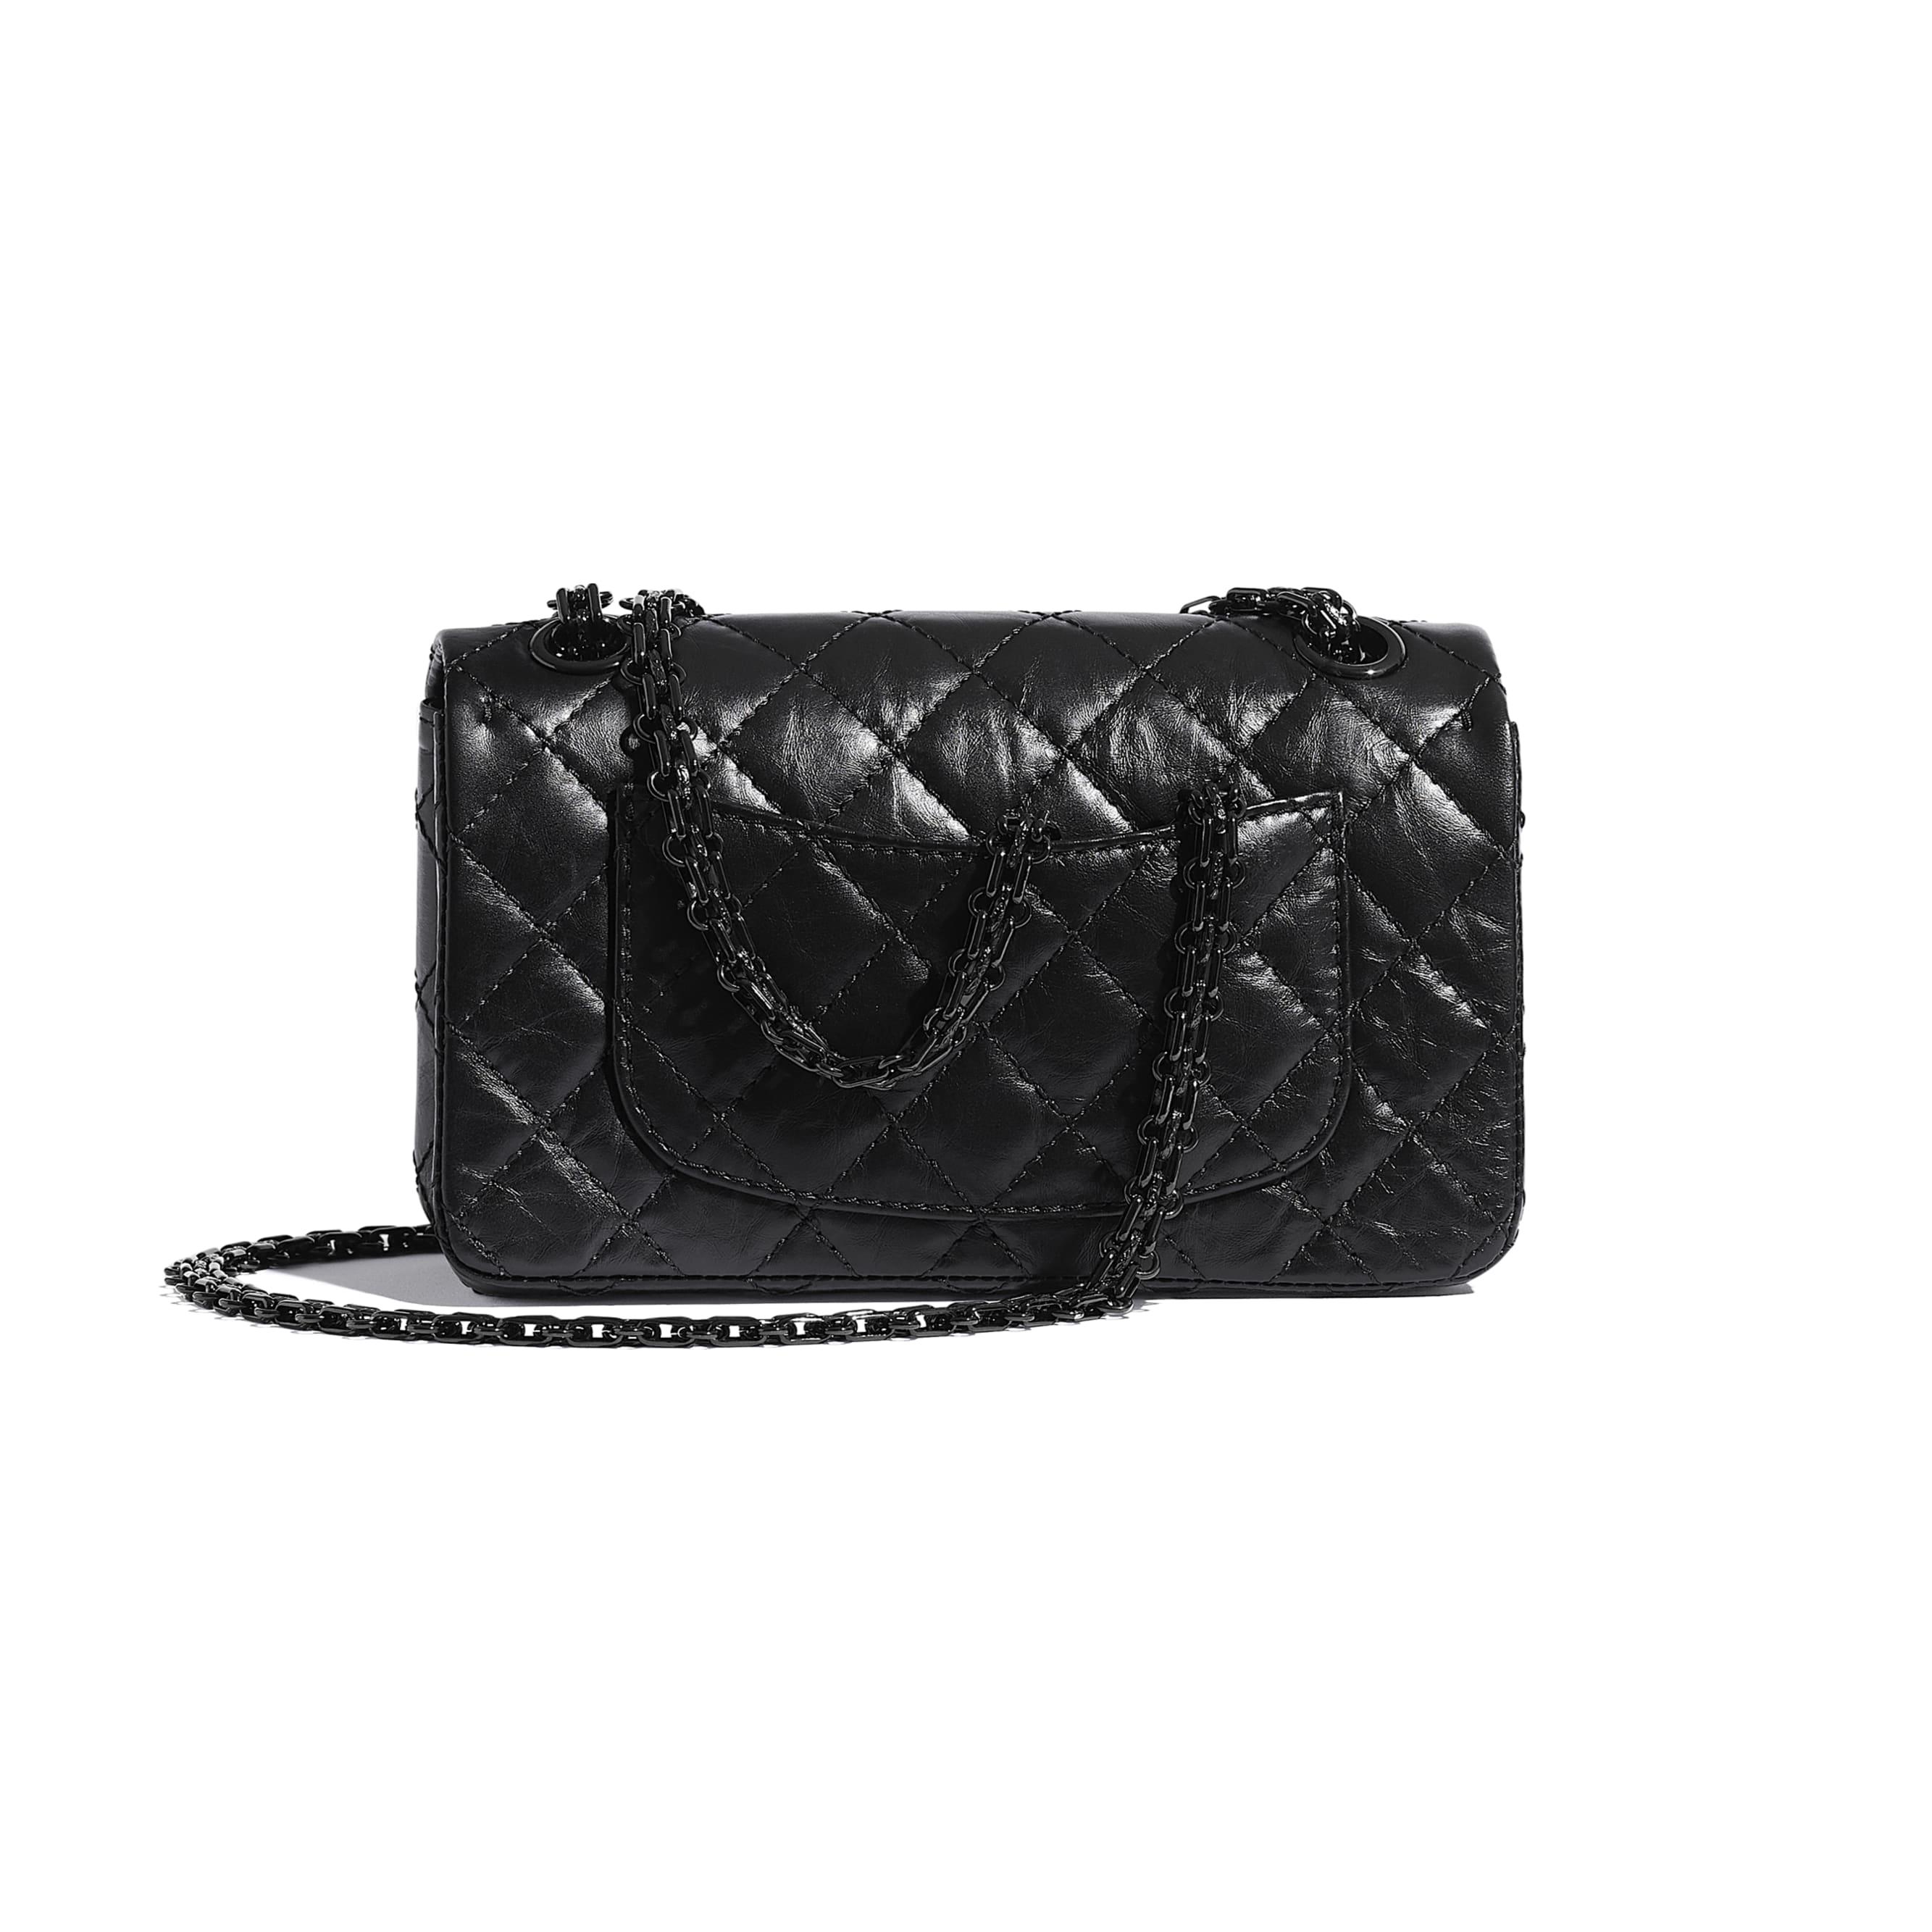 Mini 2.55 Handbag - Black - Aged Calfskin & Black Metal - CHANEL - Alternative view - see standard sized version